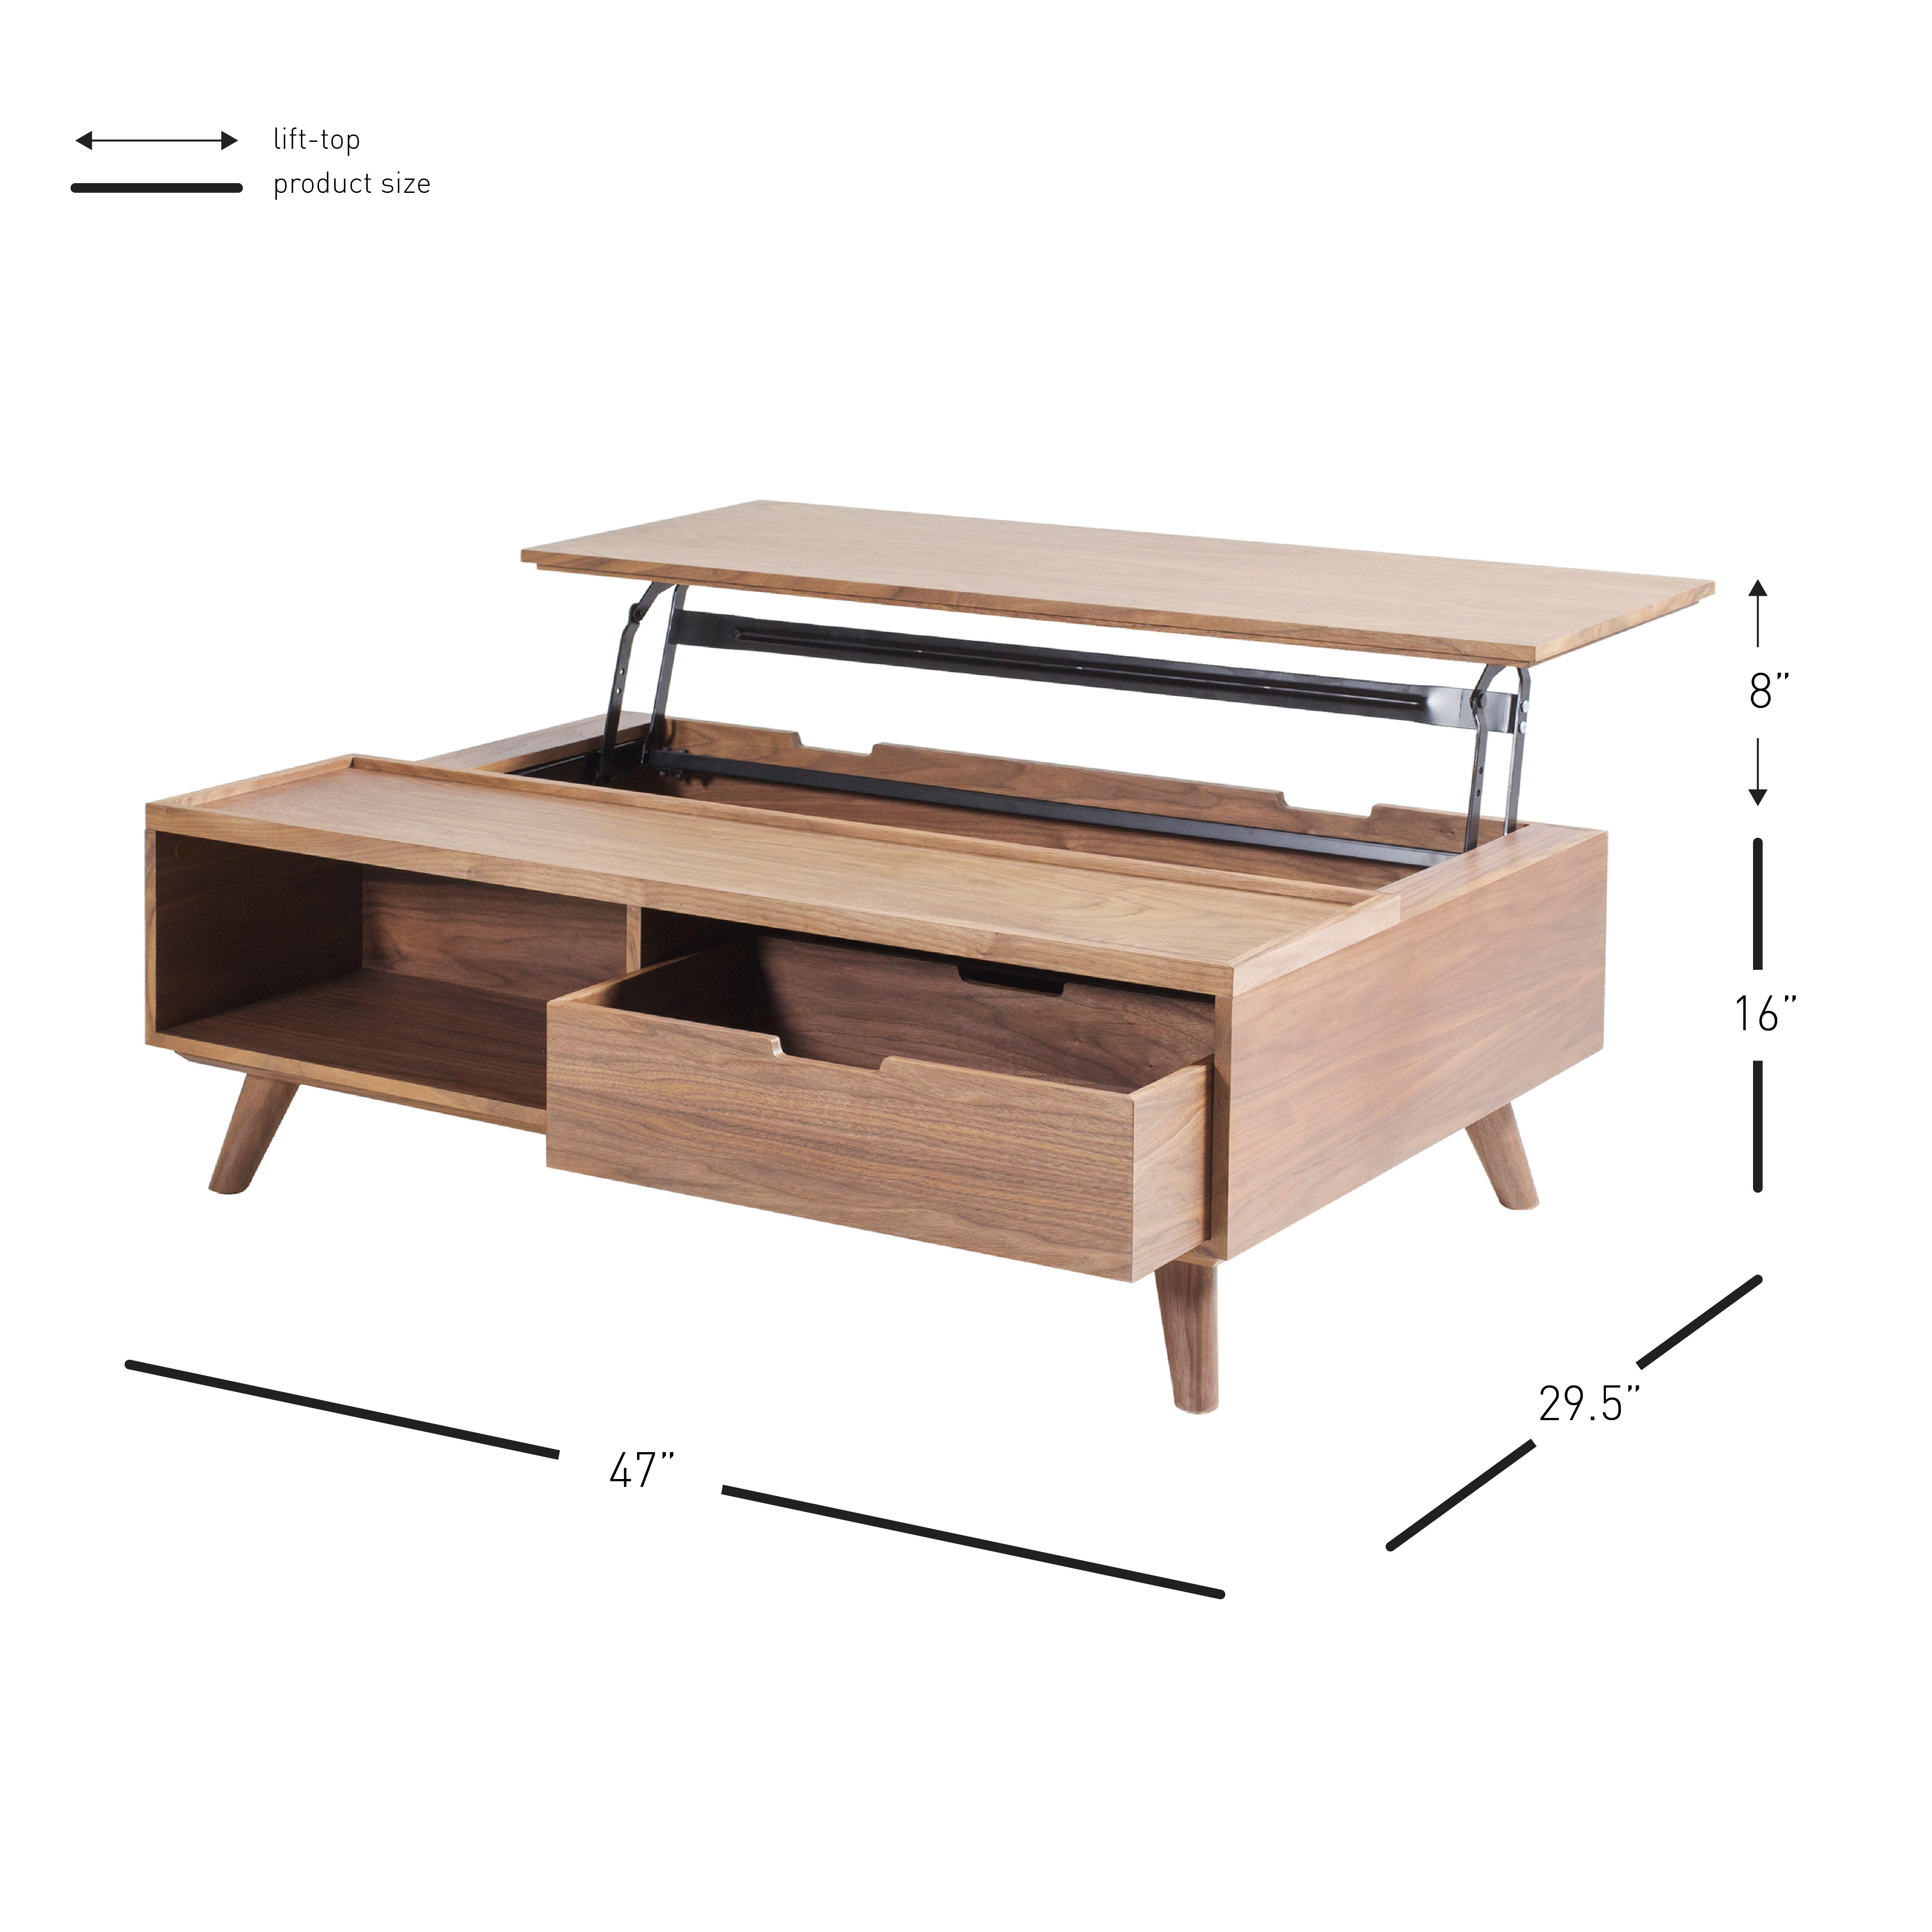 1030006 npd furniture wholesale lifestyle furniture 510 818 9388. Black Bedroom Furniture Sets. Home Design Ideas